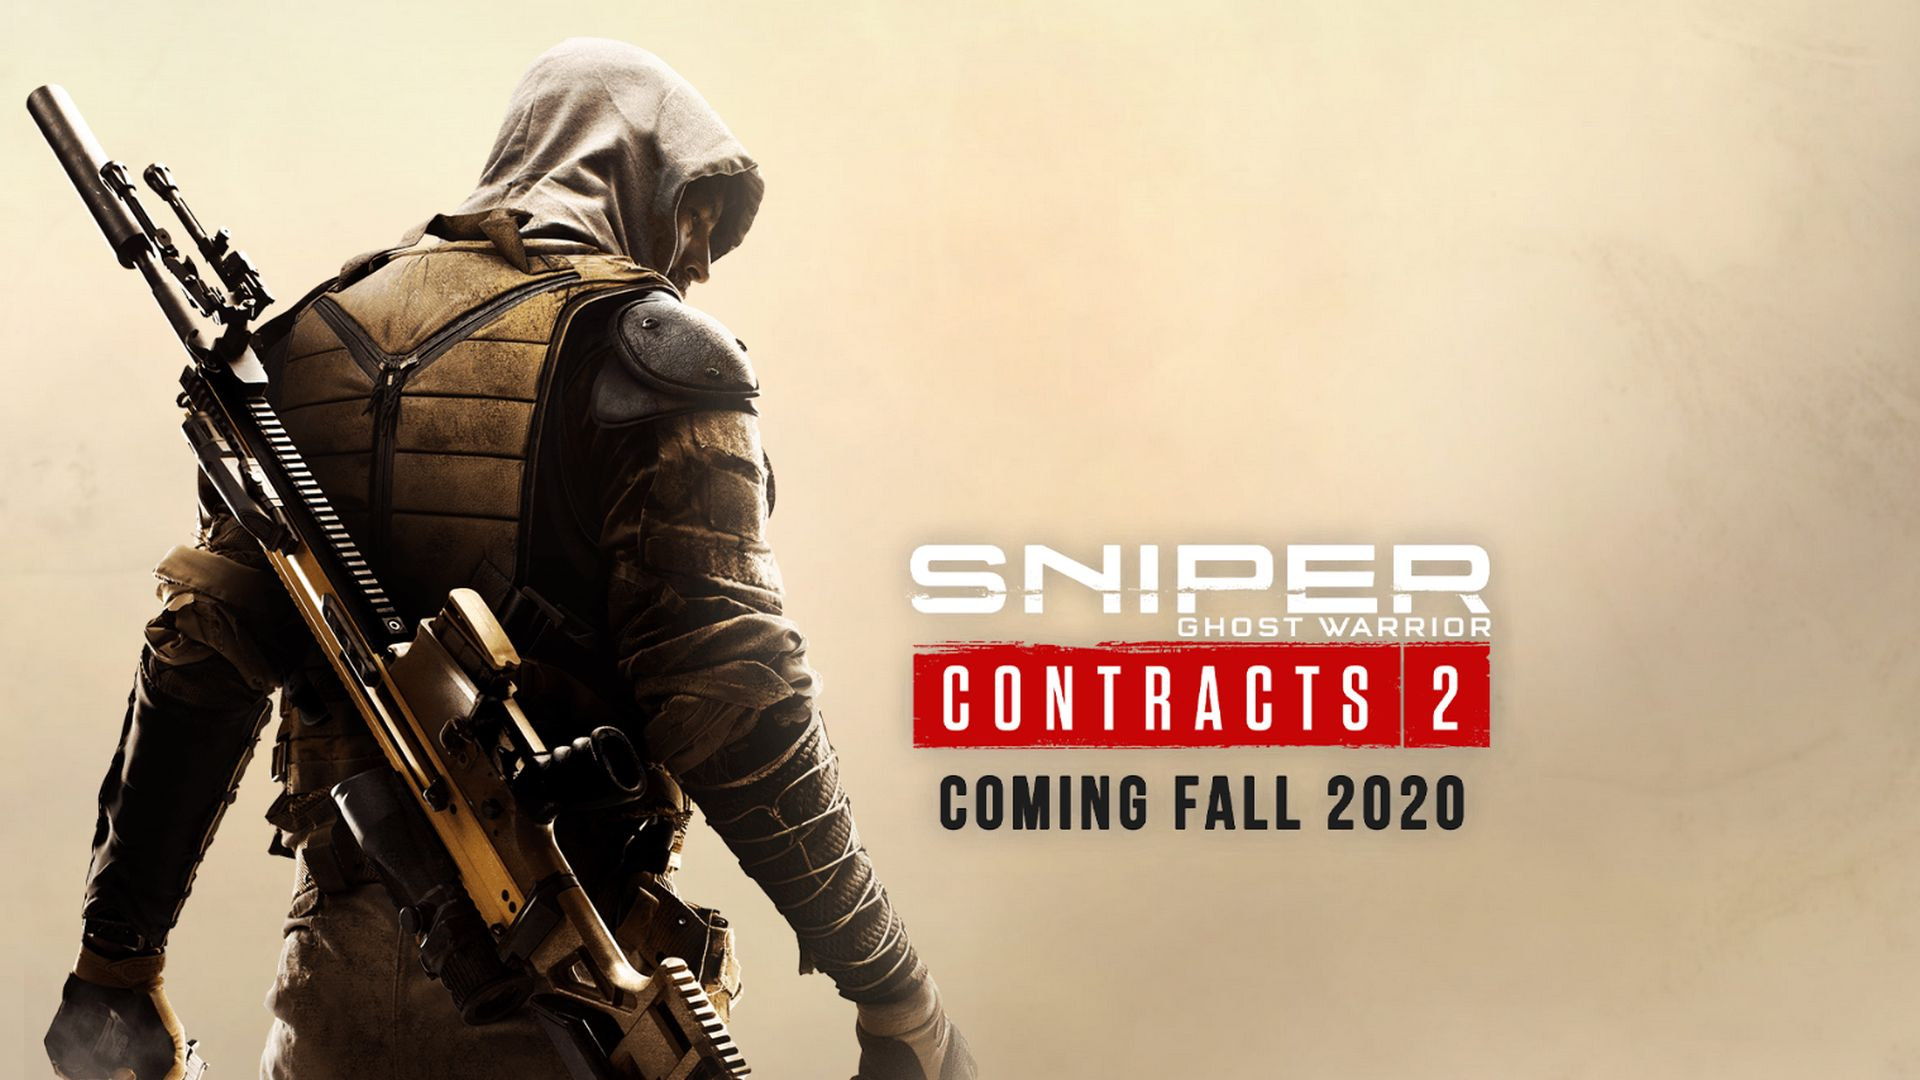 Oznámena hra Sniper Ghost Warrior: Contracts 2